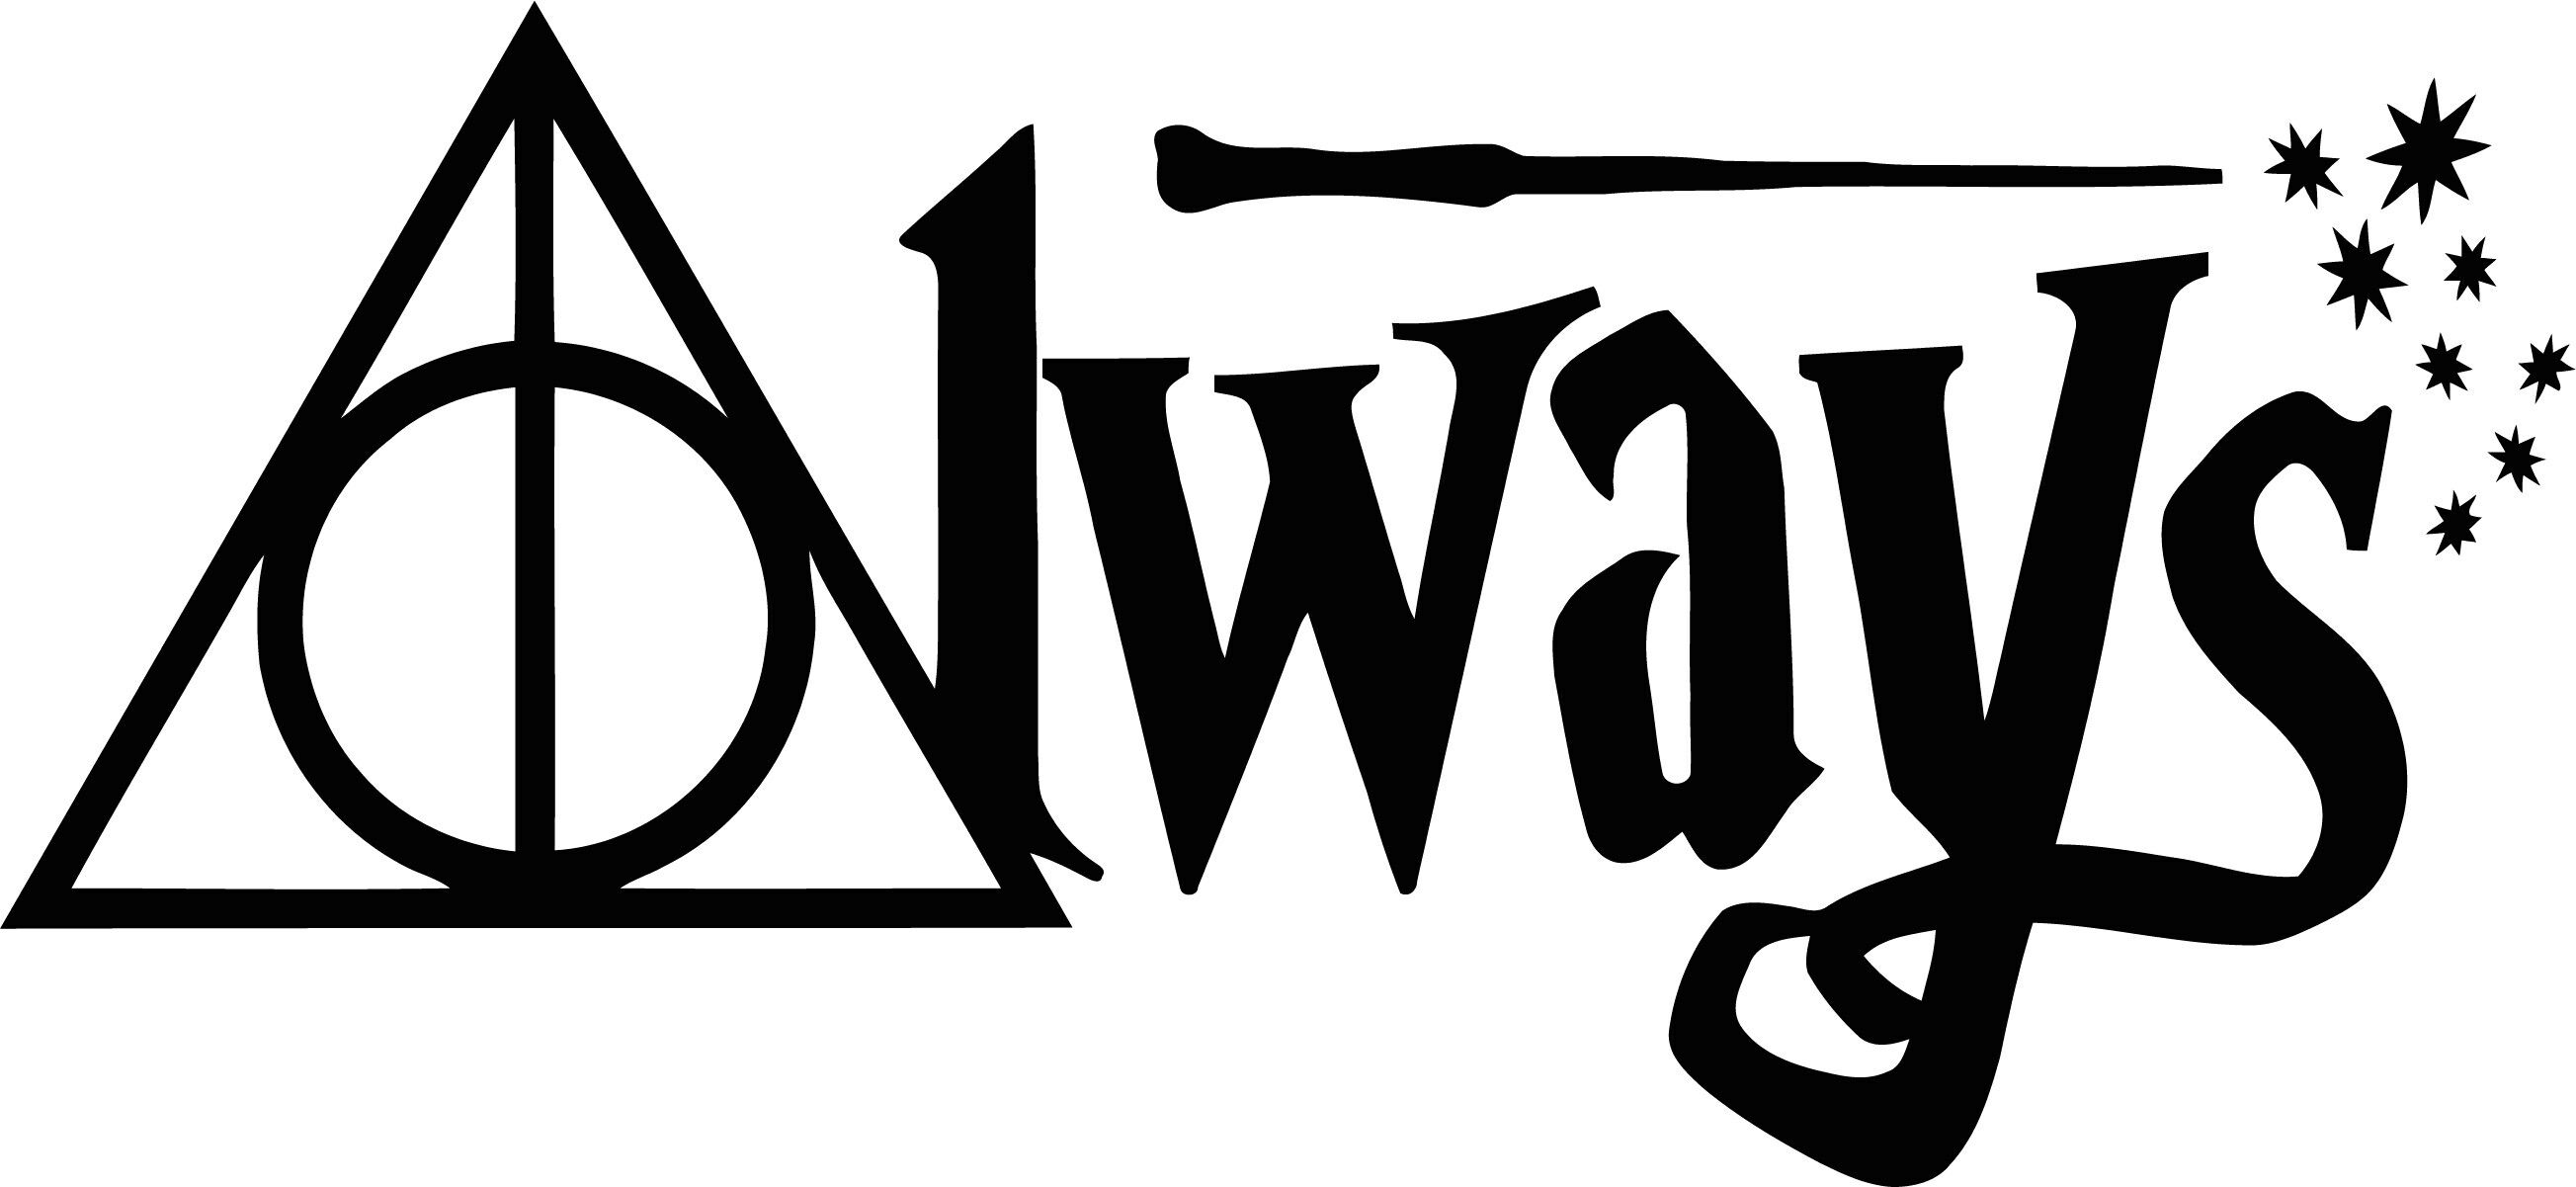 Pin On Harry Potter Clipart Font Svg Png Illustration